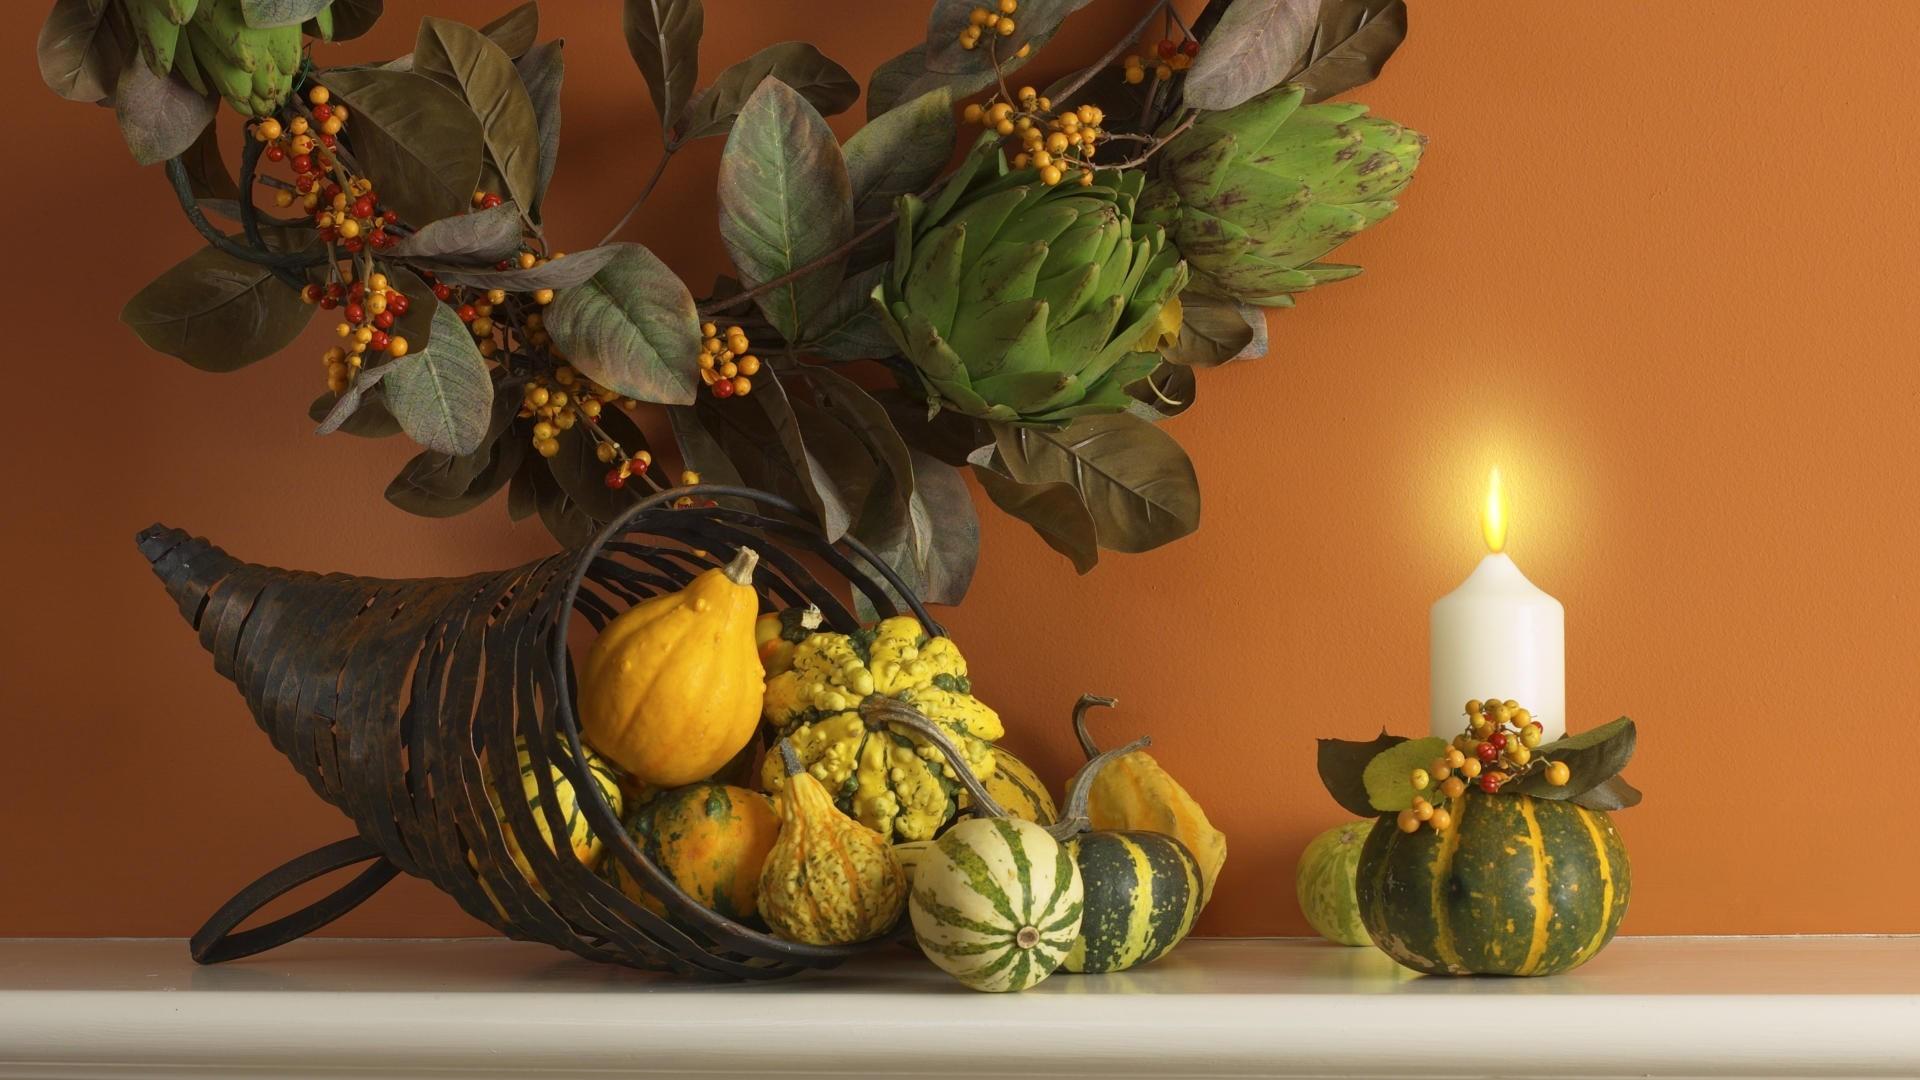 Res: 1920x1080, HW.92 Gallery: Thanksgiving Wallpaper , 308.34 Kb